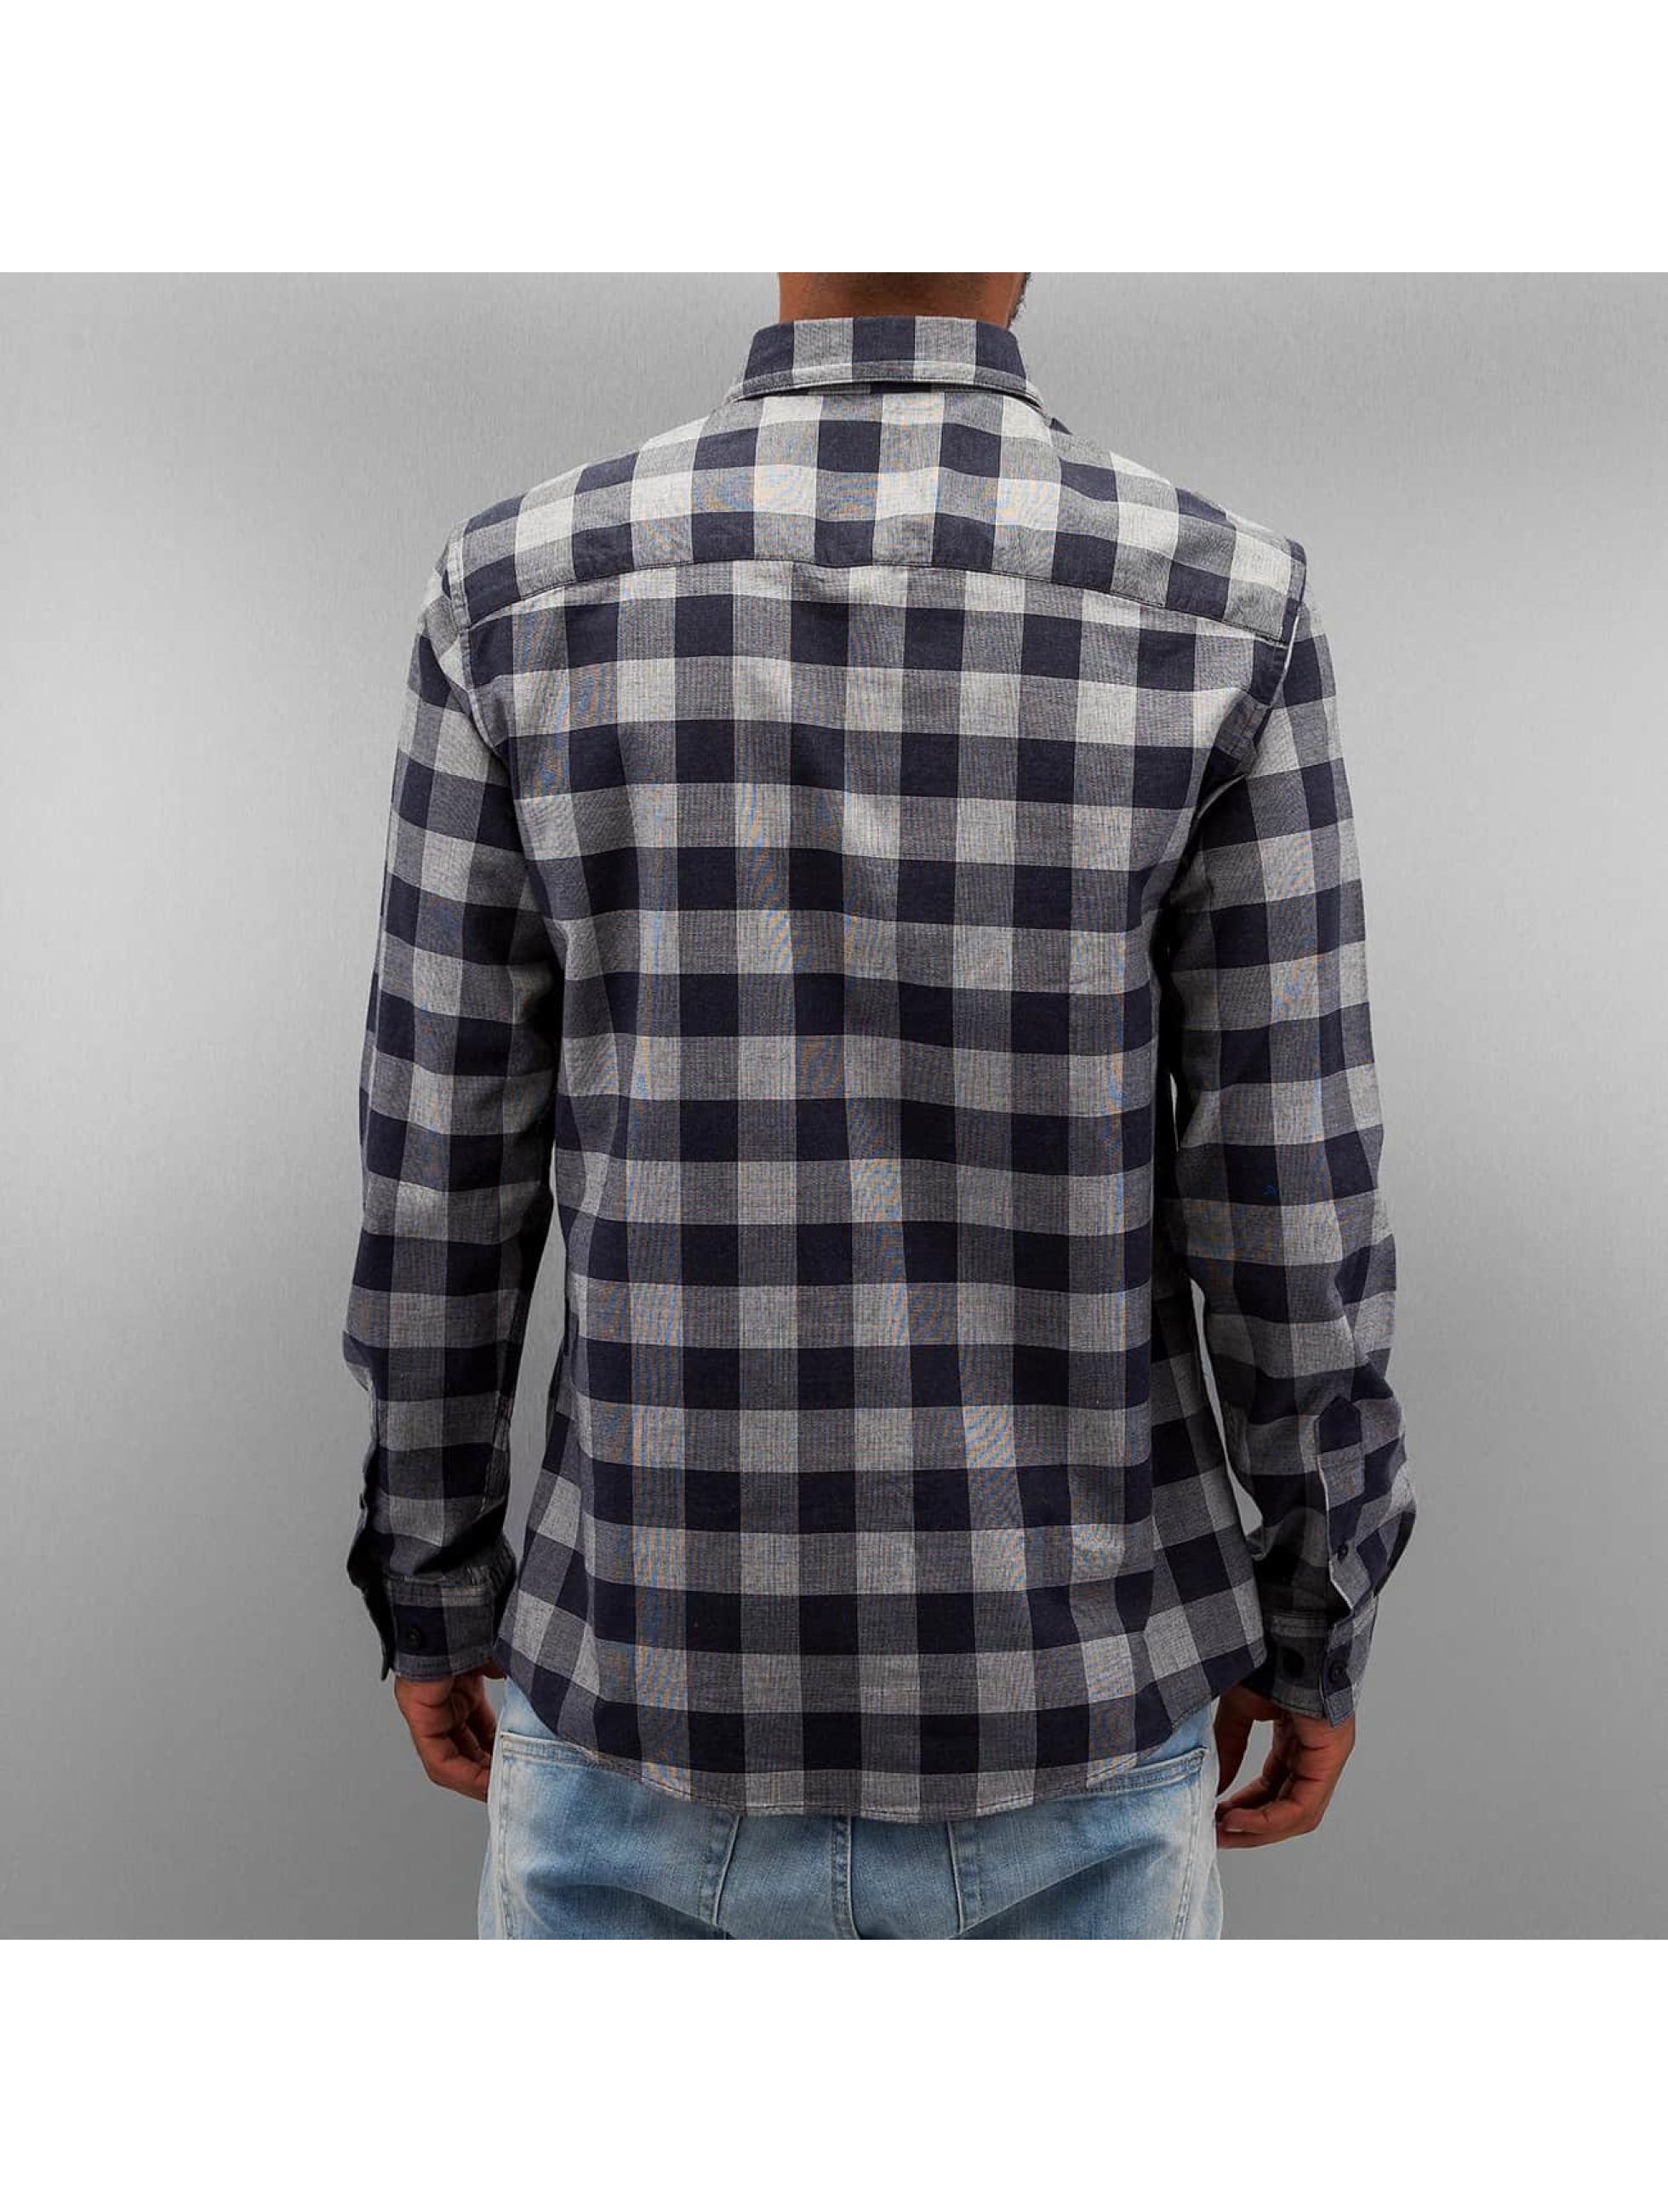 Jack & Jones Shirt jcoJames gray